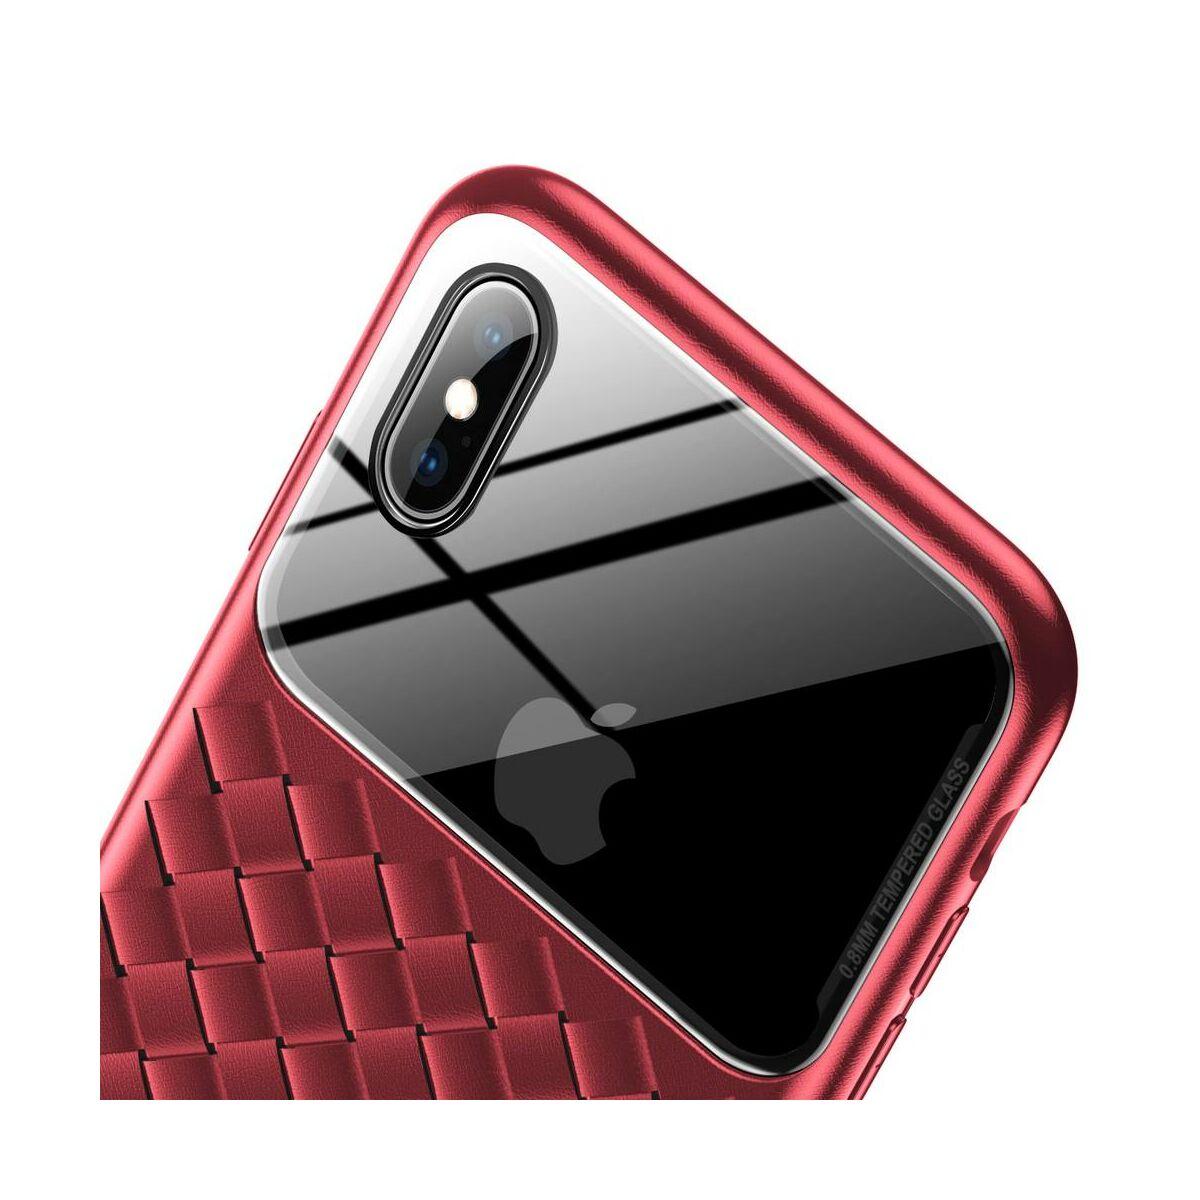 Baseus iPhone XS Max üveg & tok, BV Weaving, piros (WIAPIPH65-BL09)